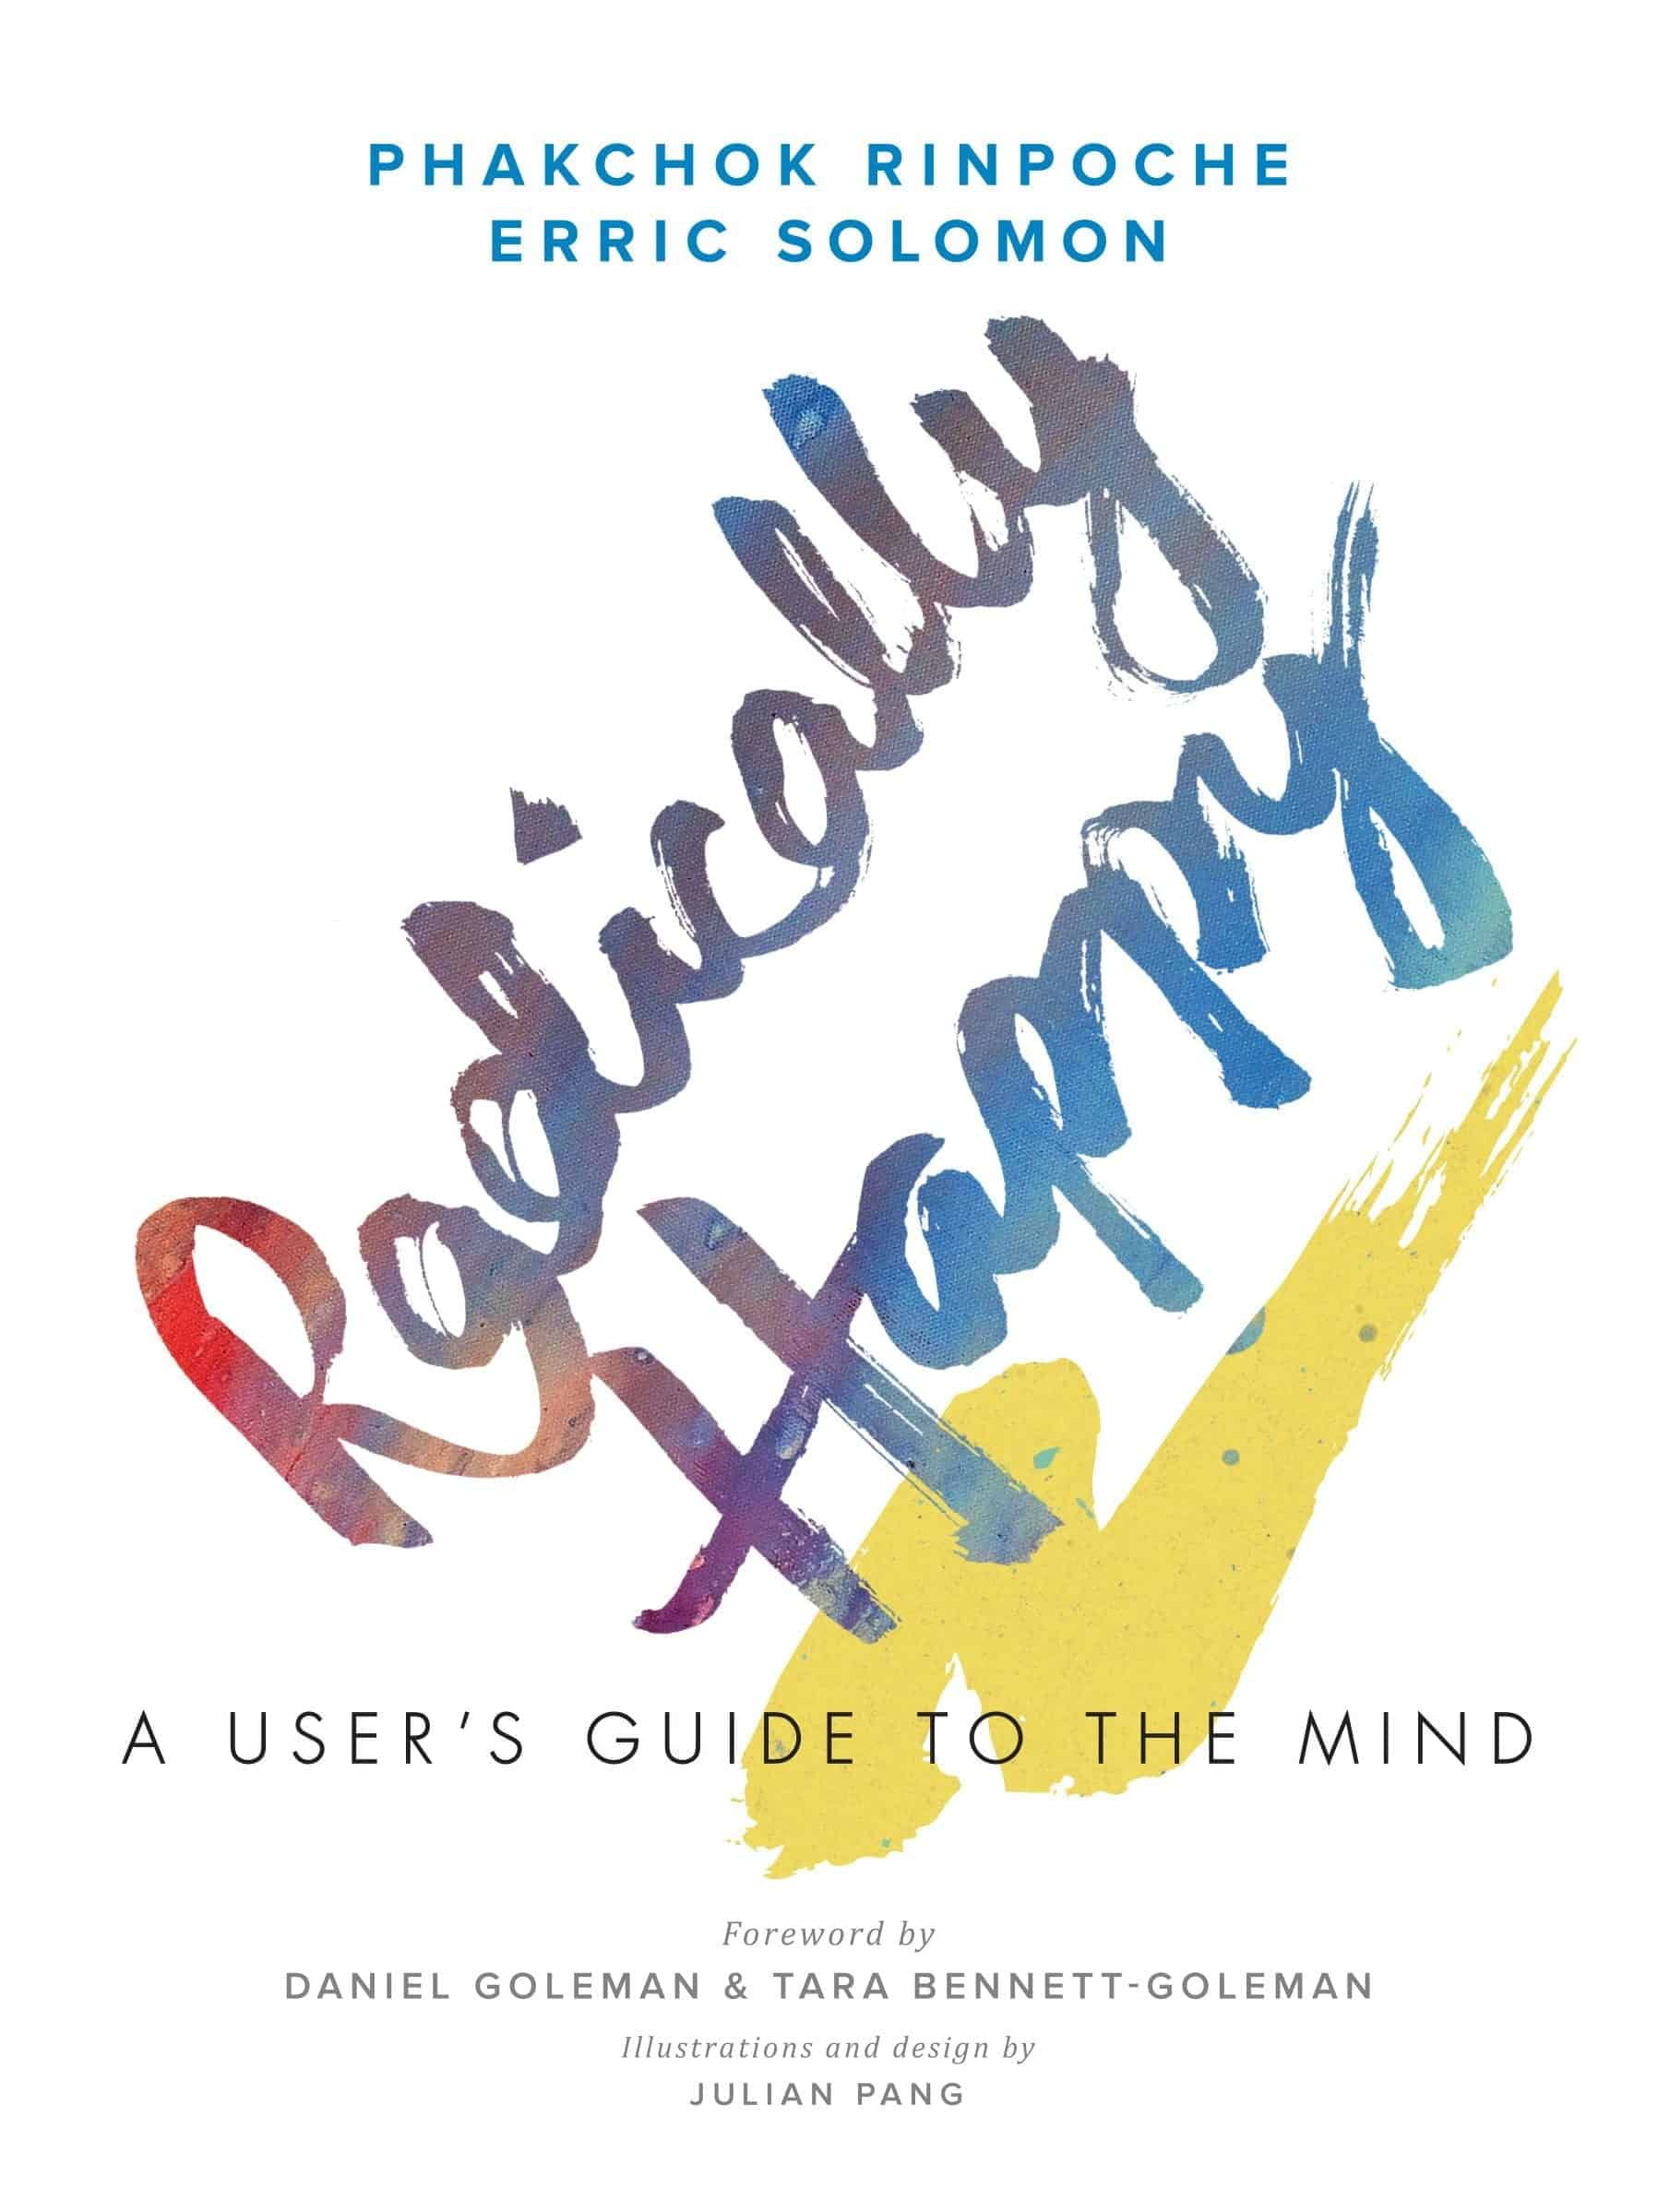 Radically Happy Book Release